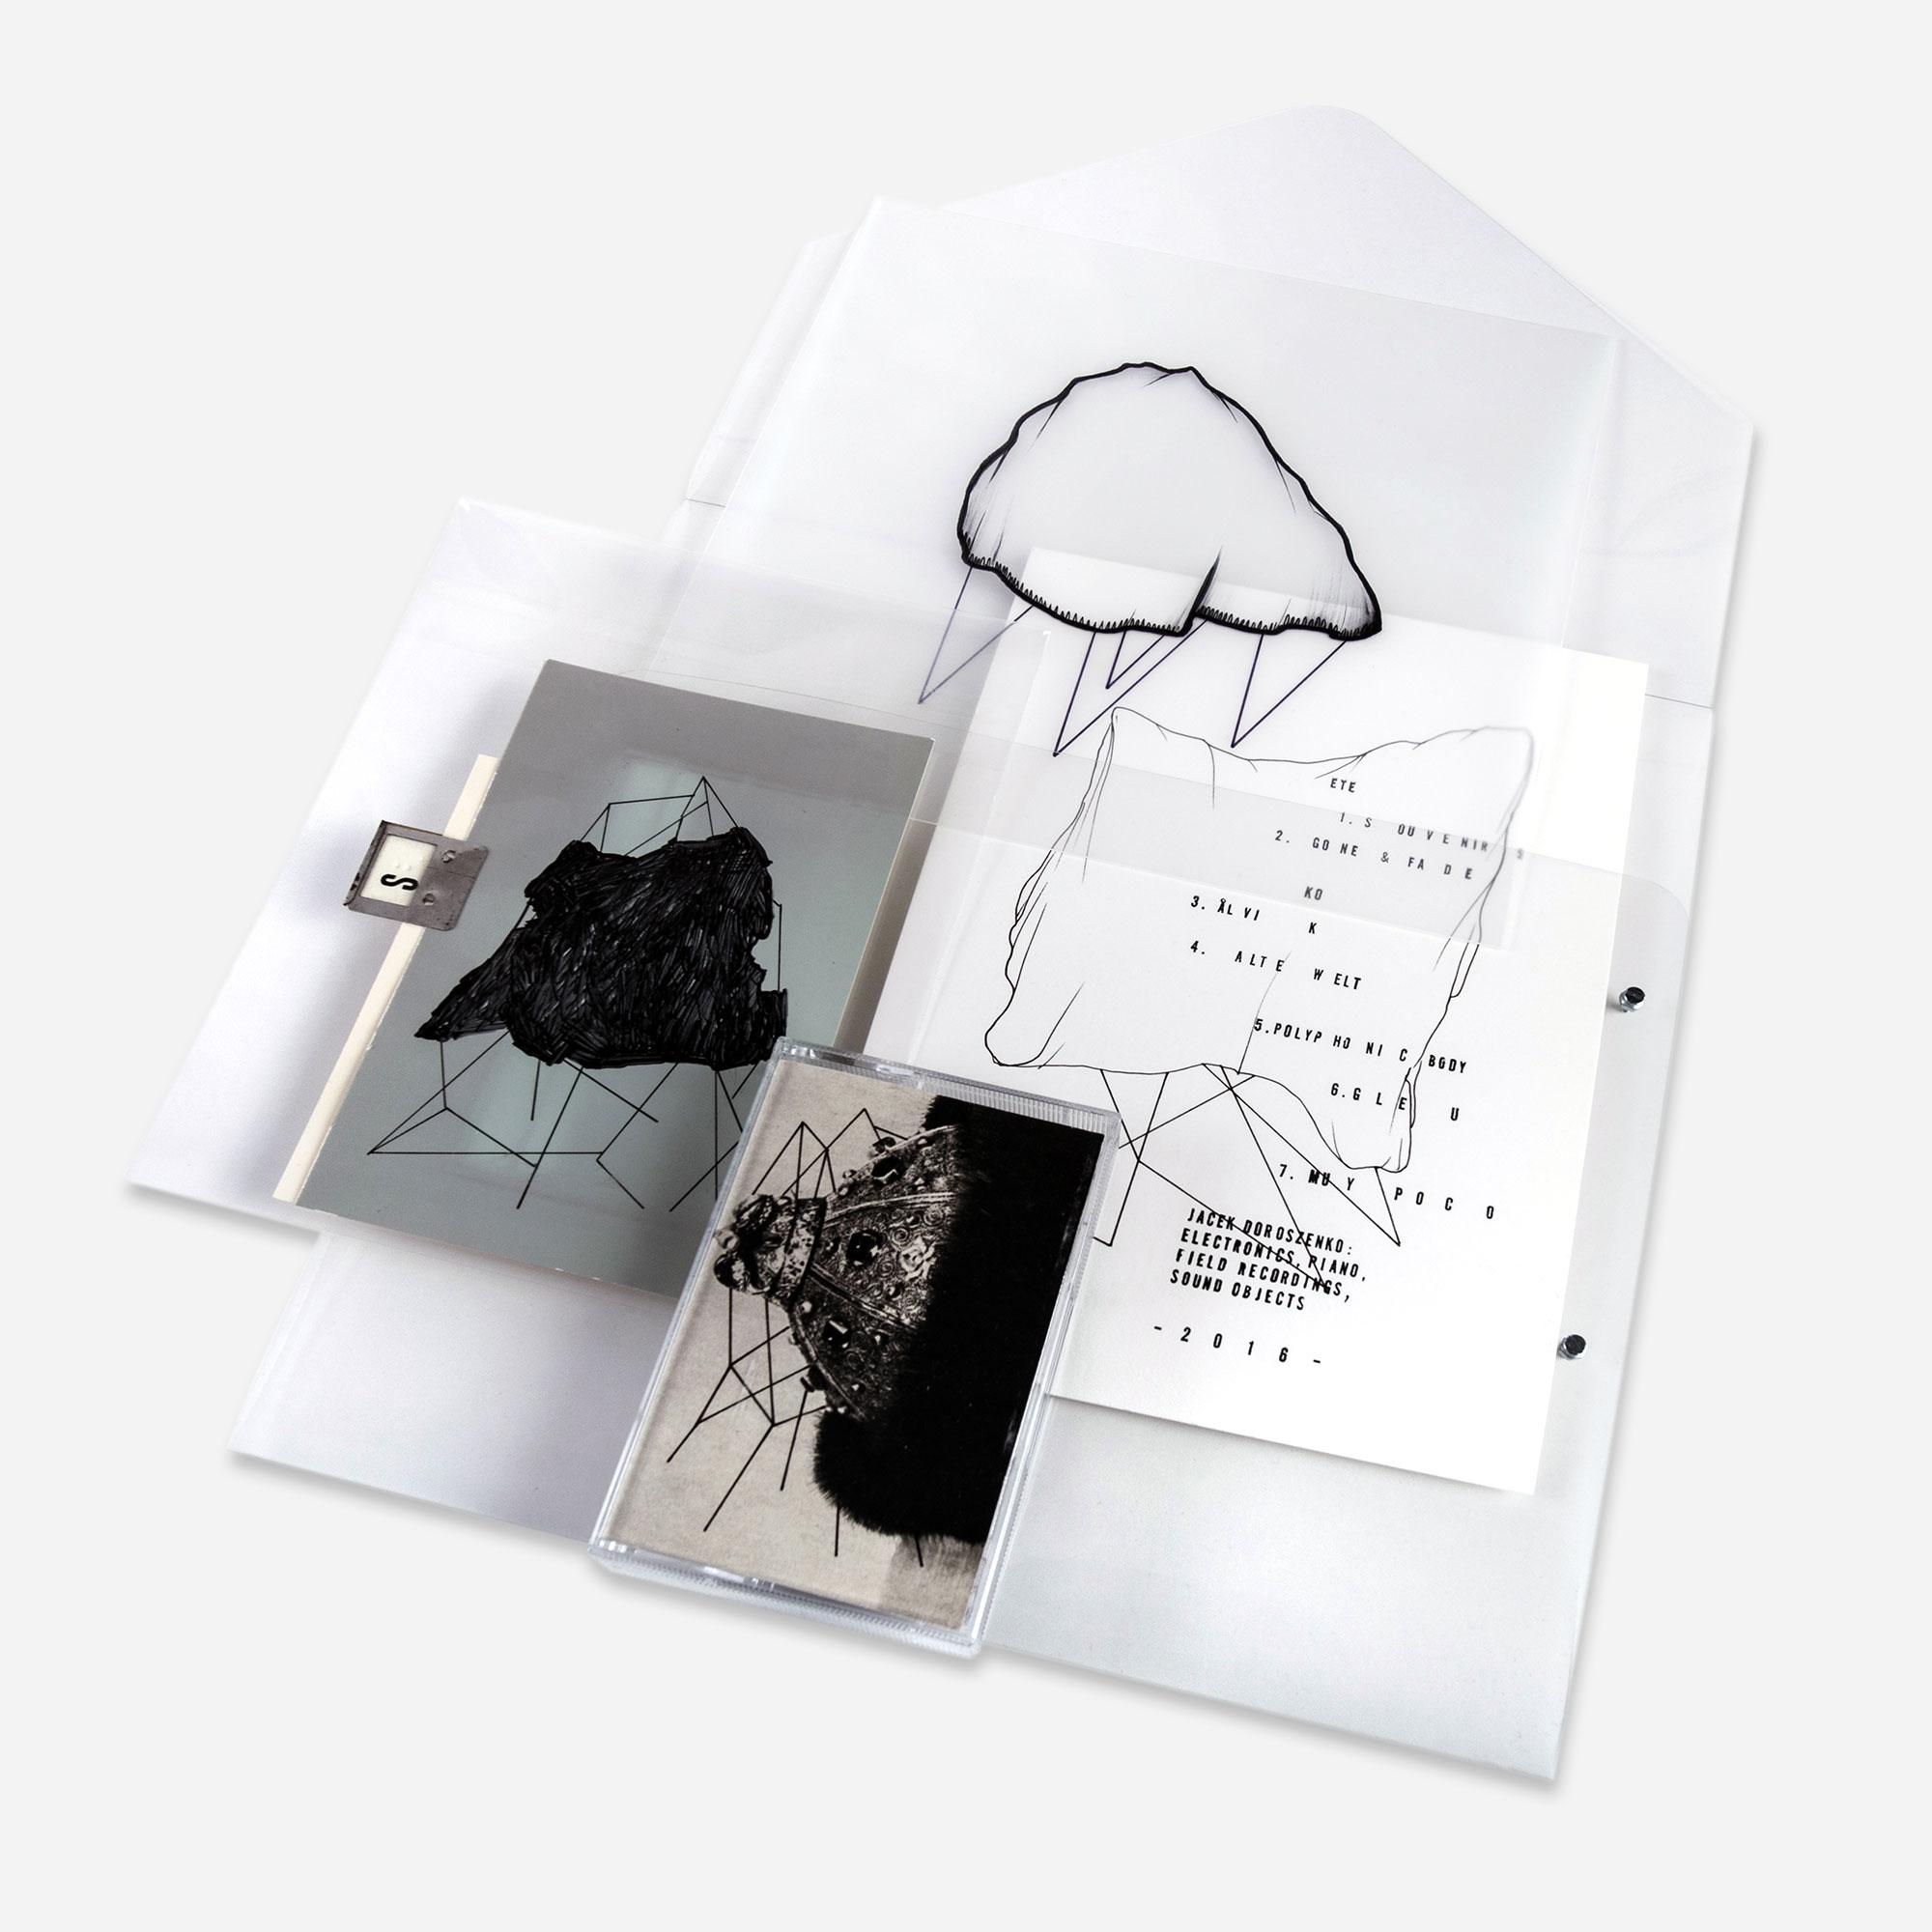 Jacek Doroszenko - Useful Remnants, music album 03